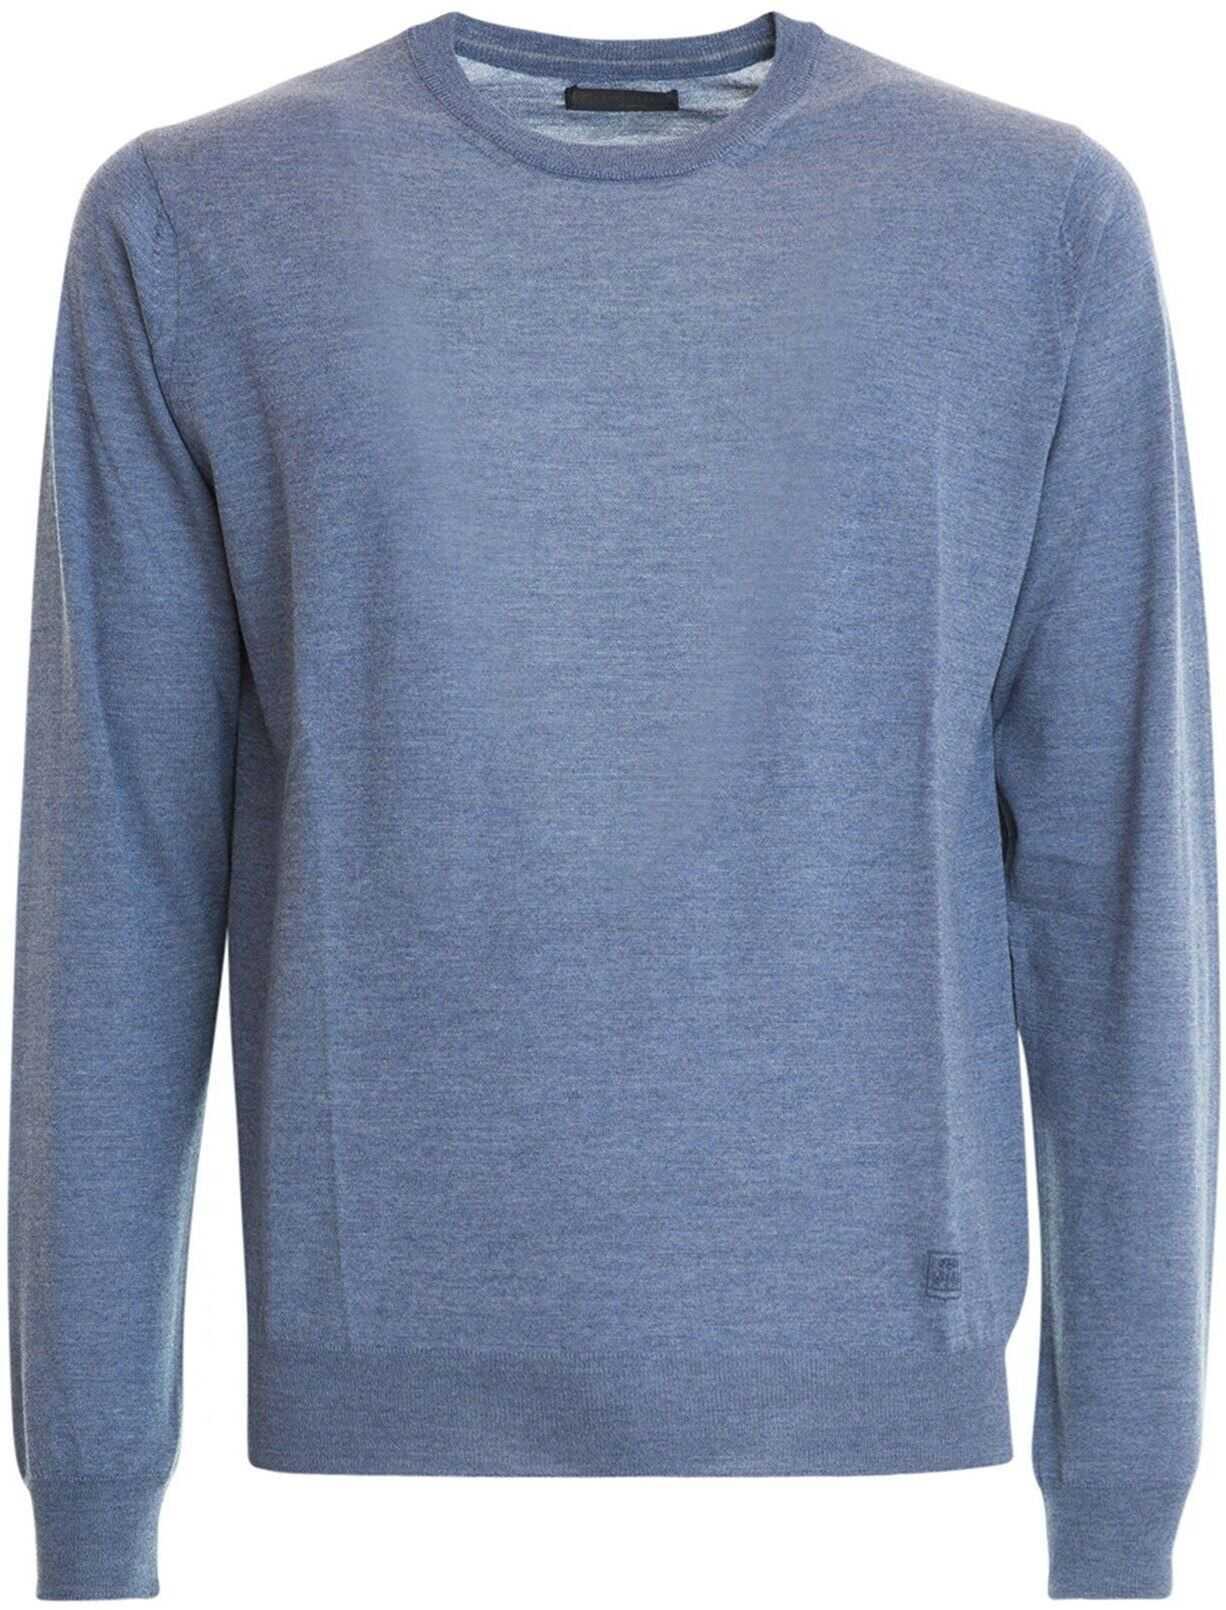 CORNELIANI Melange Wool Crew Neck Sweater In Light Blue Light Blue imagine